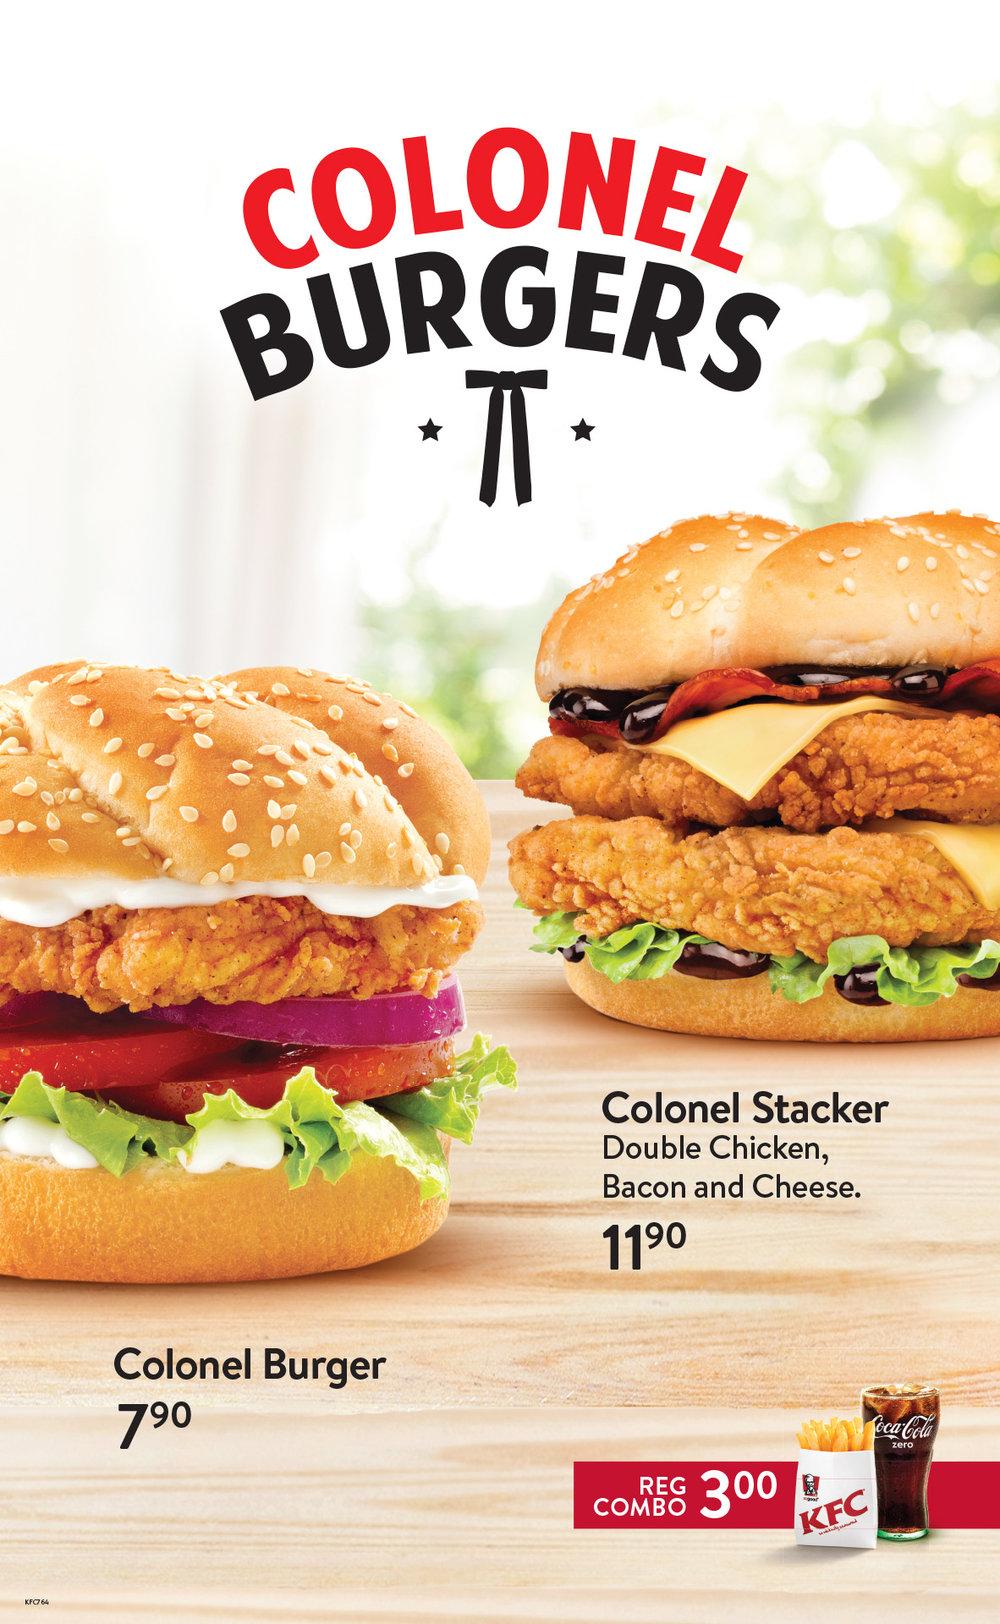 KFC0970_Colonel Burgers_Full Static MP_ƒ.jpg